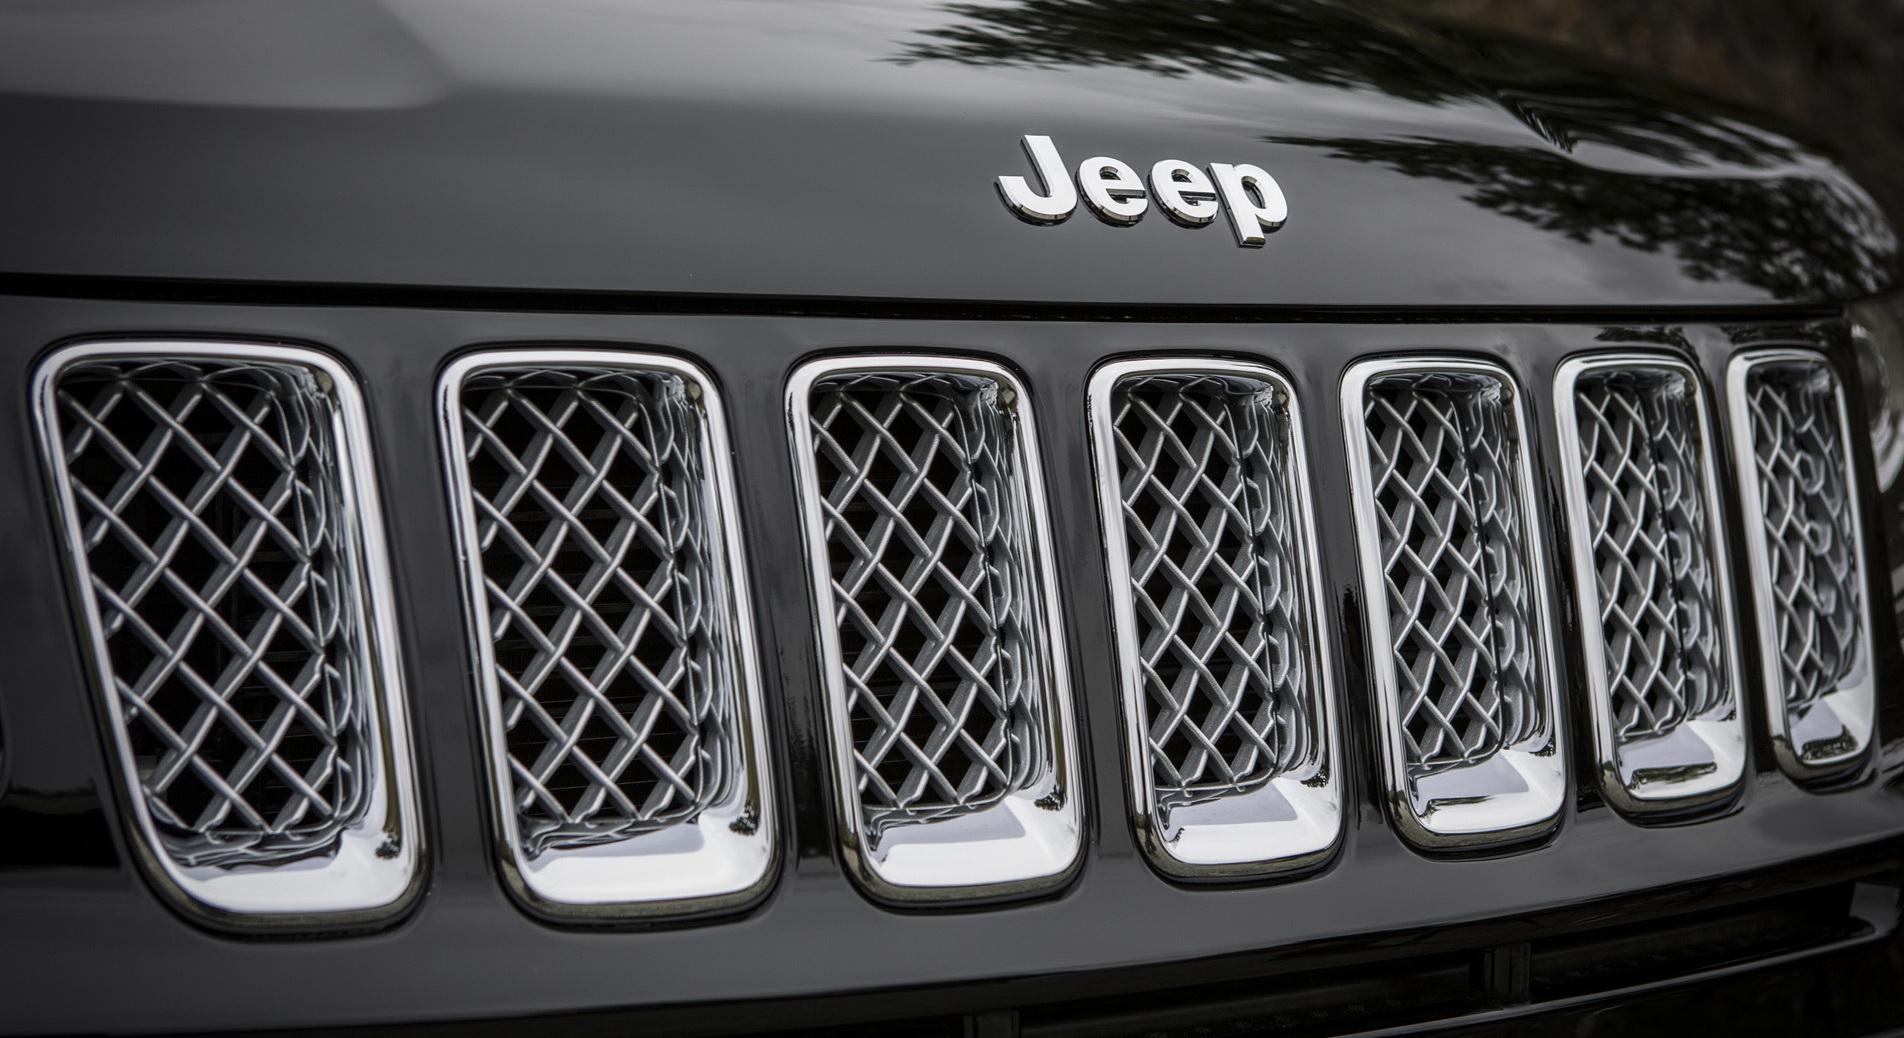 jeep-grill-wallpaper-wallpaper-4